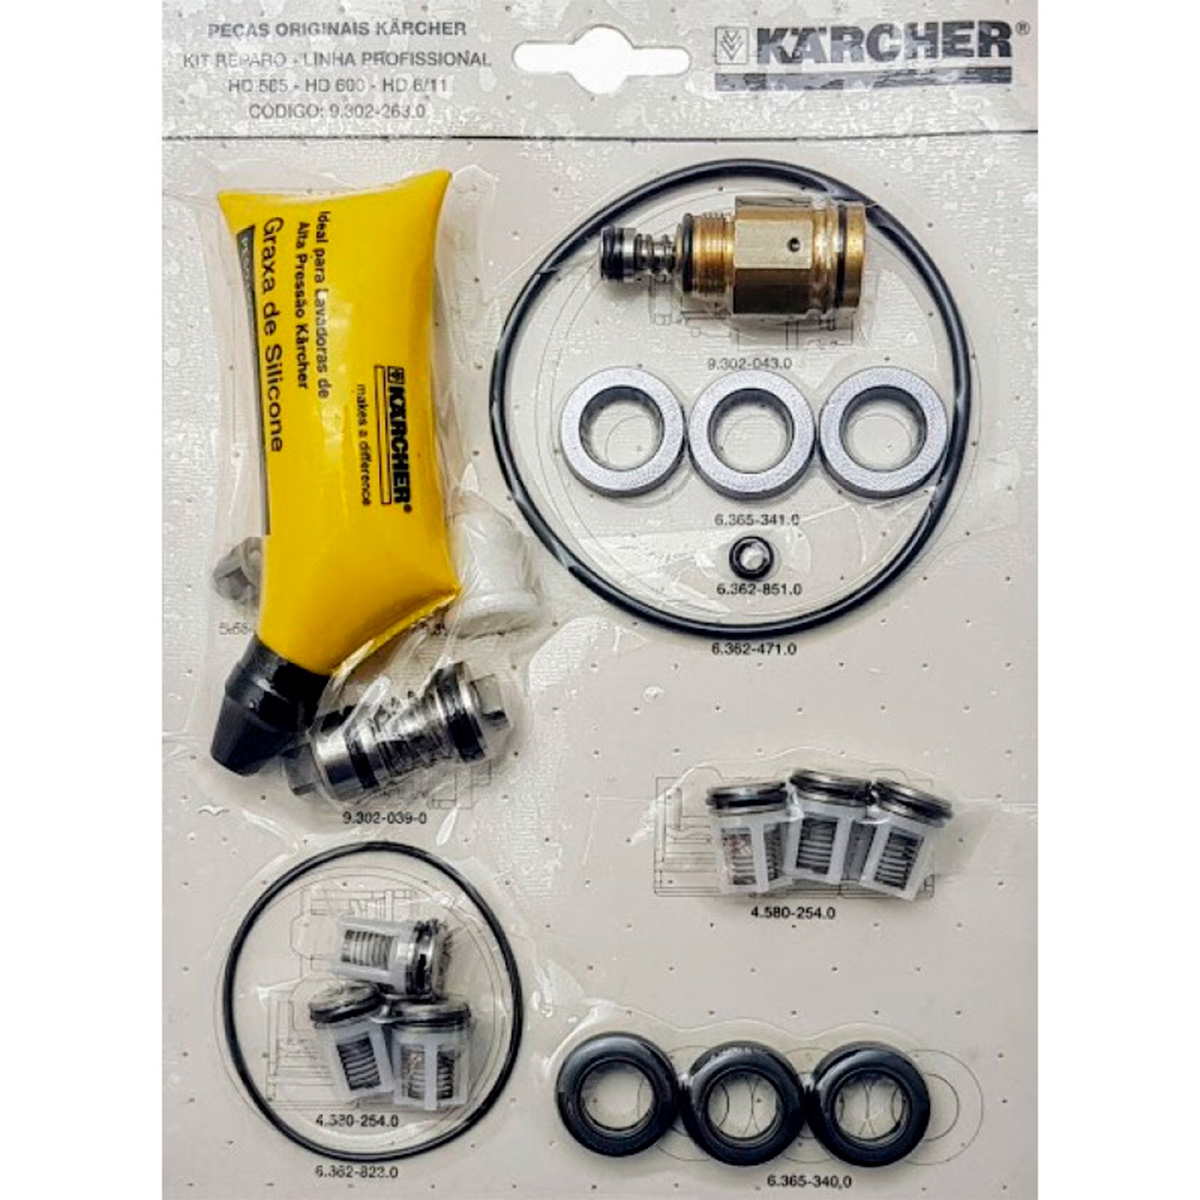 Kit Reparo para Lavadora de Alta Pressão Karcher HD585, HD600, HD6/11, HD5/12C C/19pçs Original